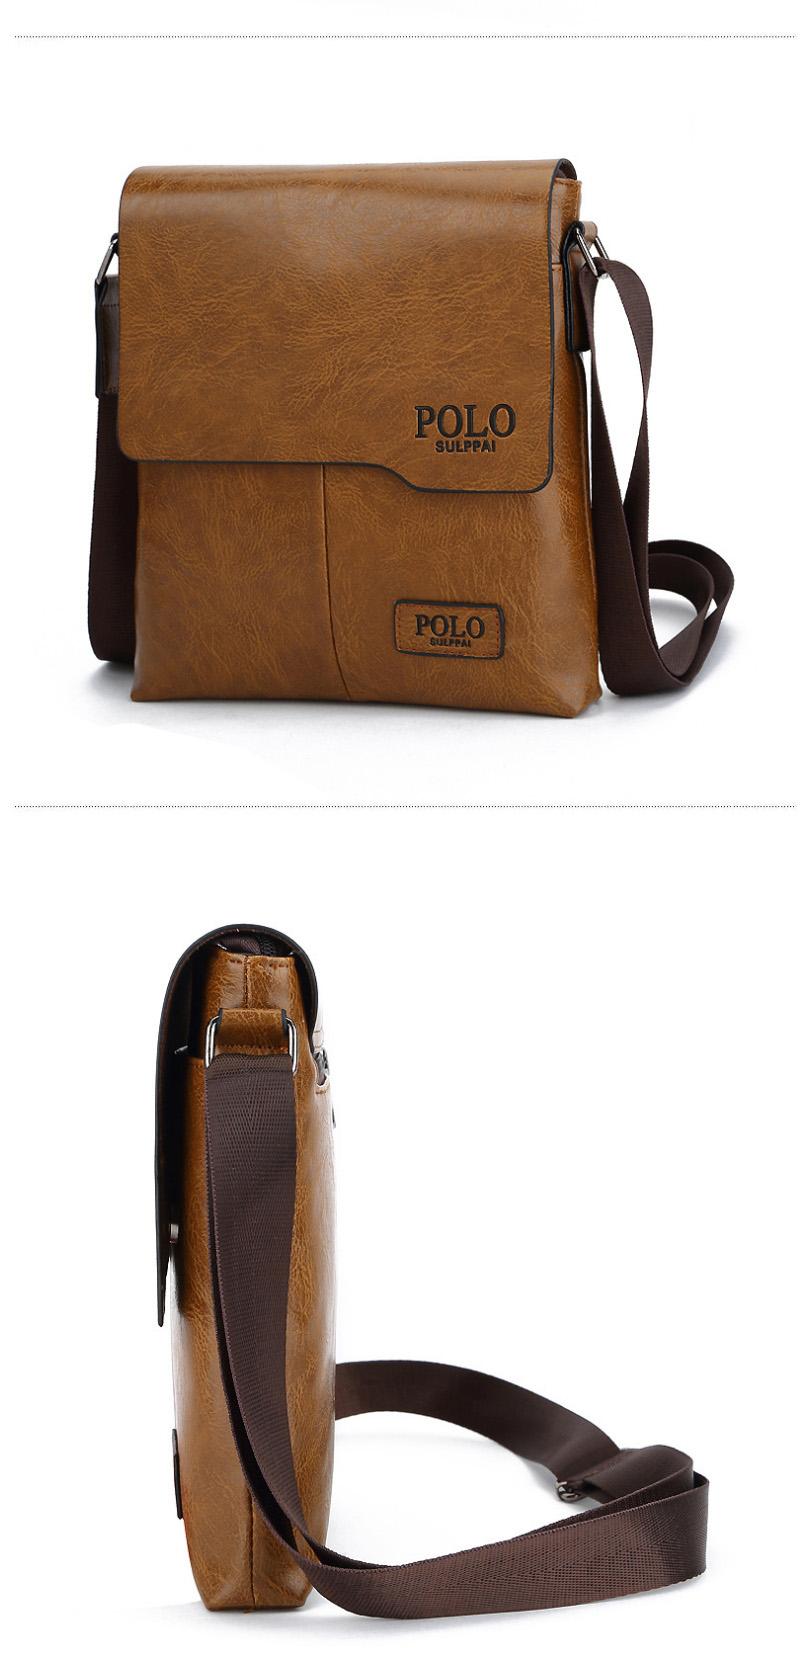 b7fa1ba7e3e5 Designer POLO Bags Hot Sale Messenger Bag Men Leather High Quality  Crossbody Man Shoulder Bag. NB402 01 NB402 02 NB402 03 ...